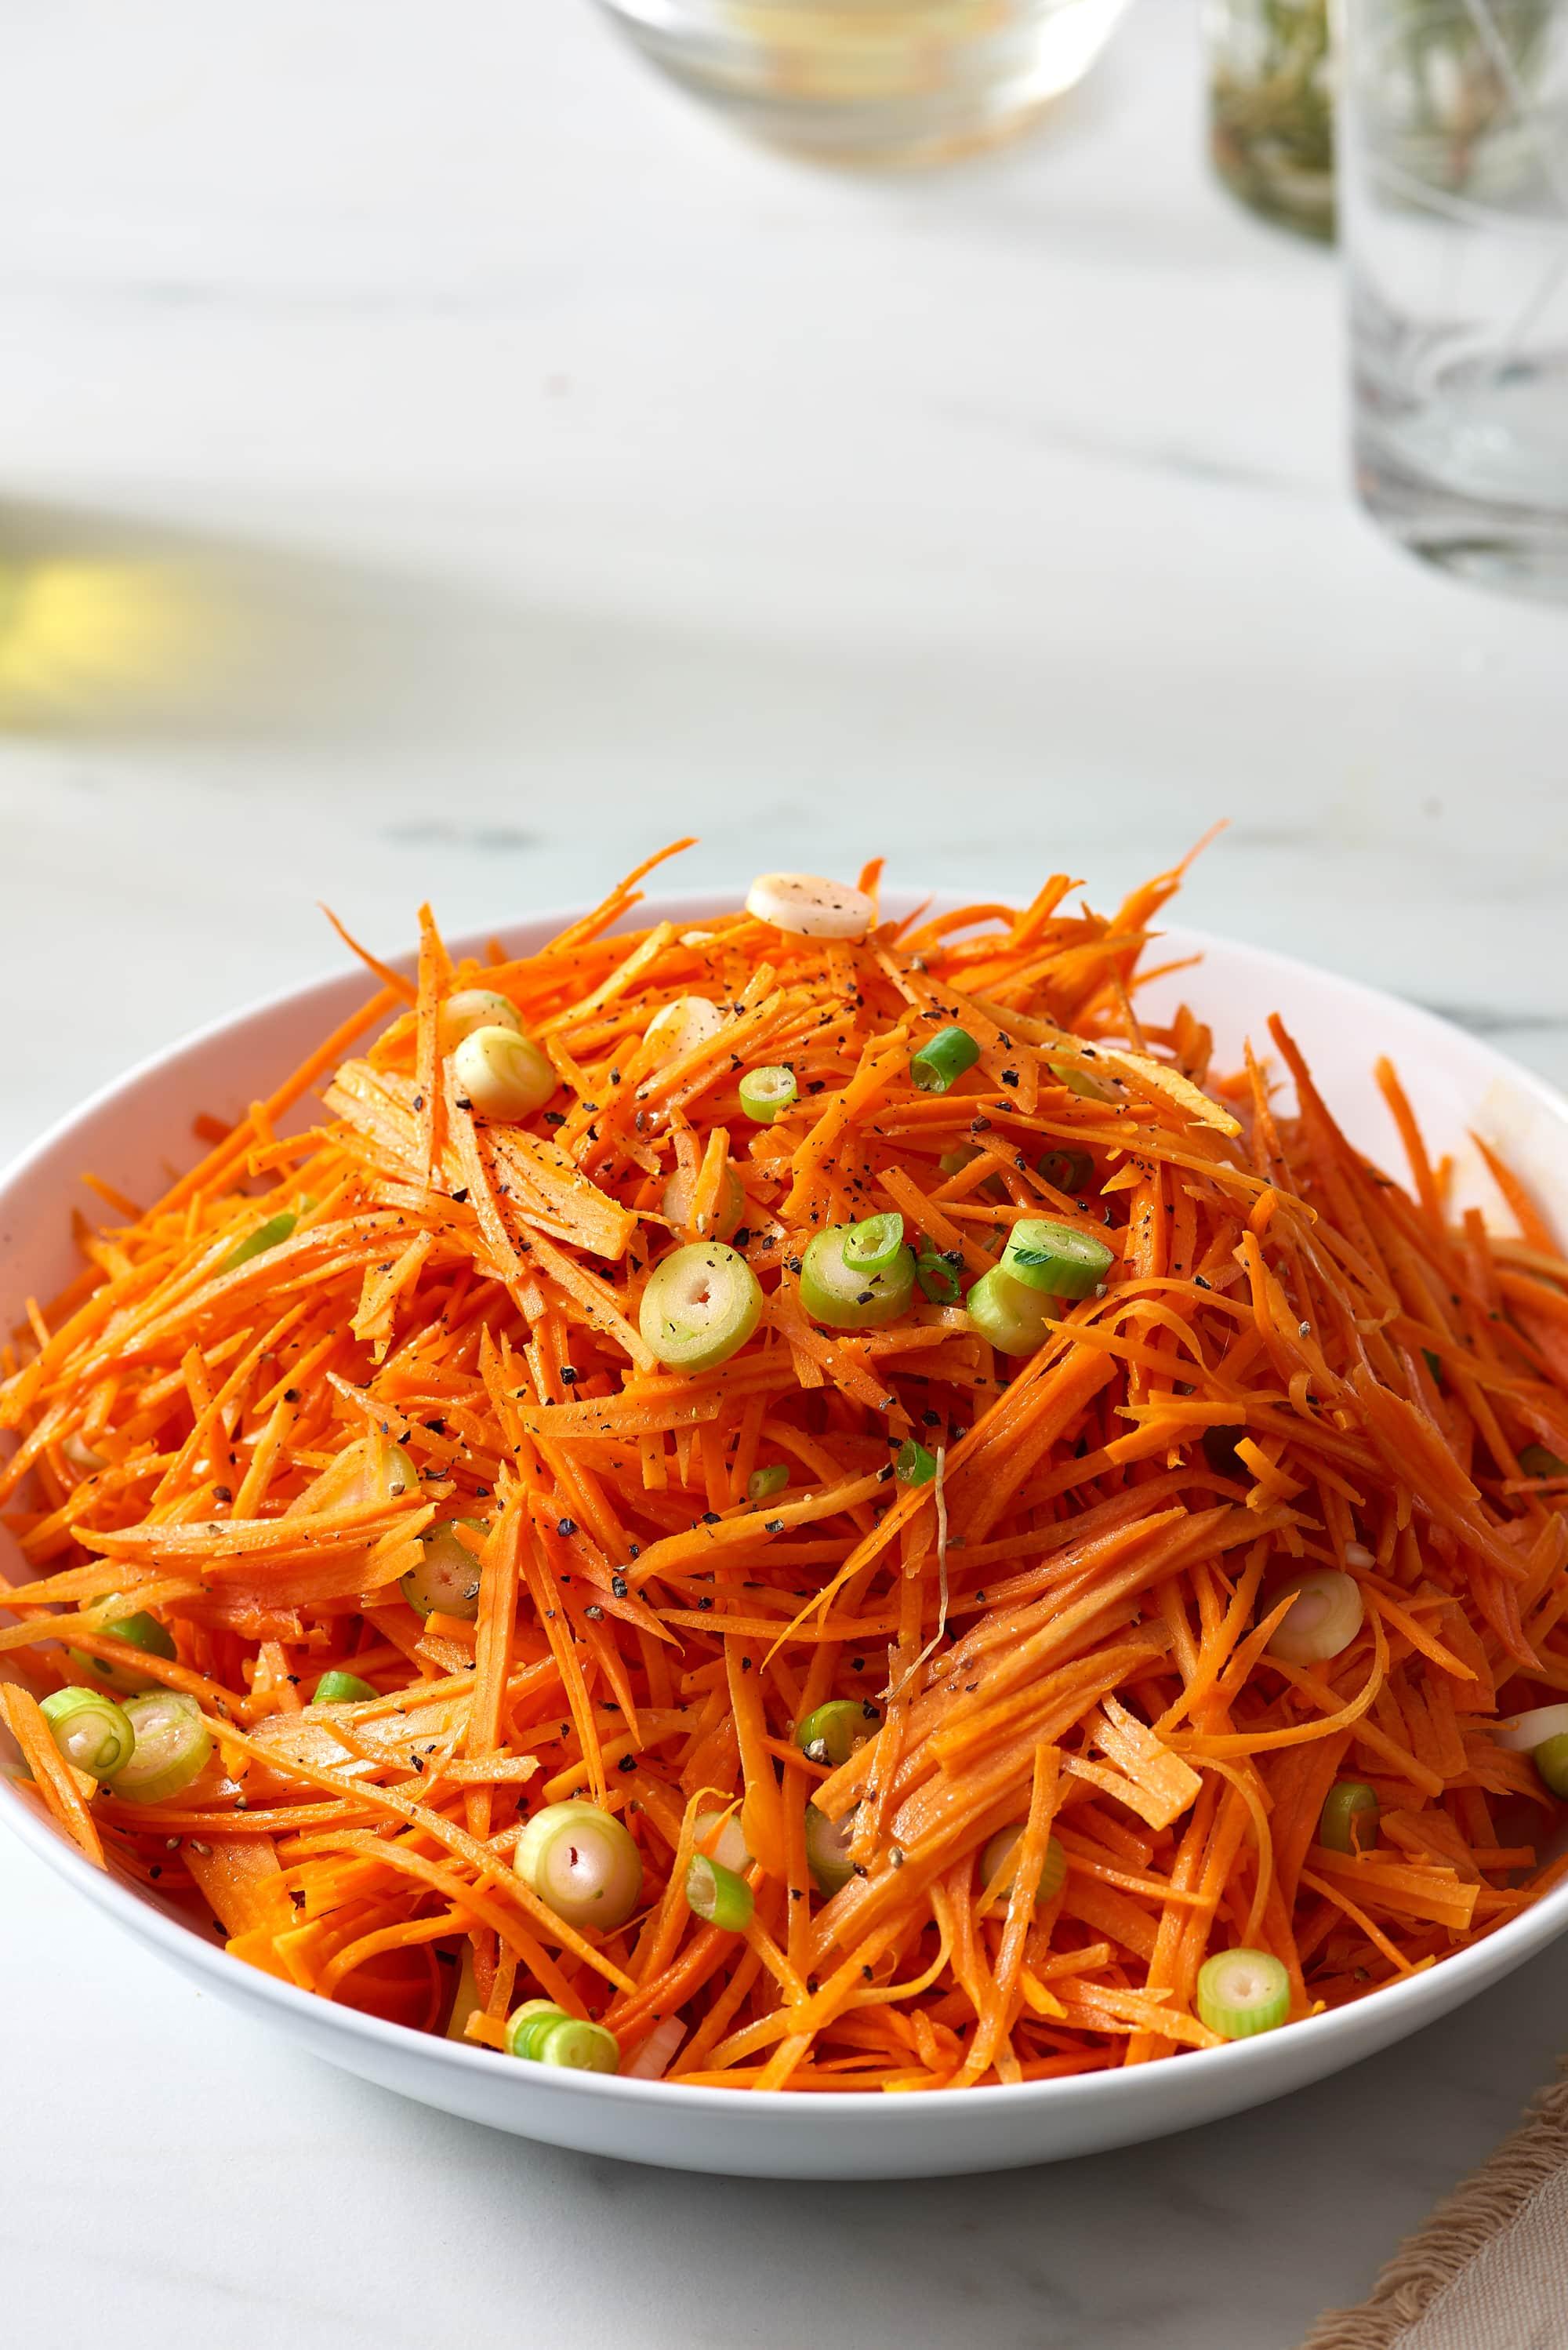 Recipe: Tangy Carrot Slaw